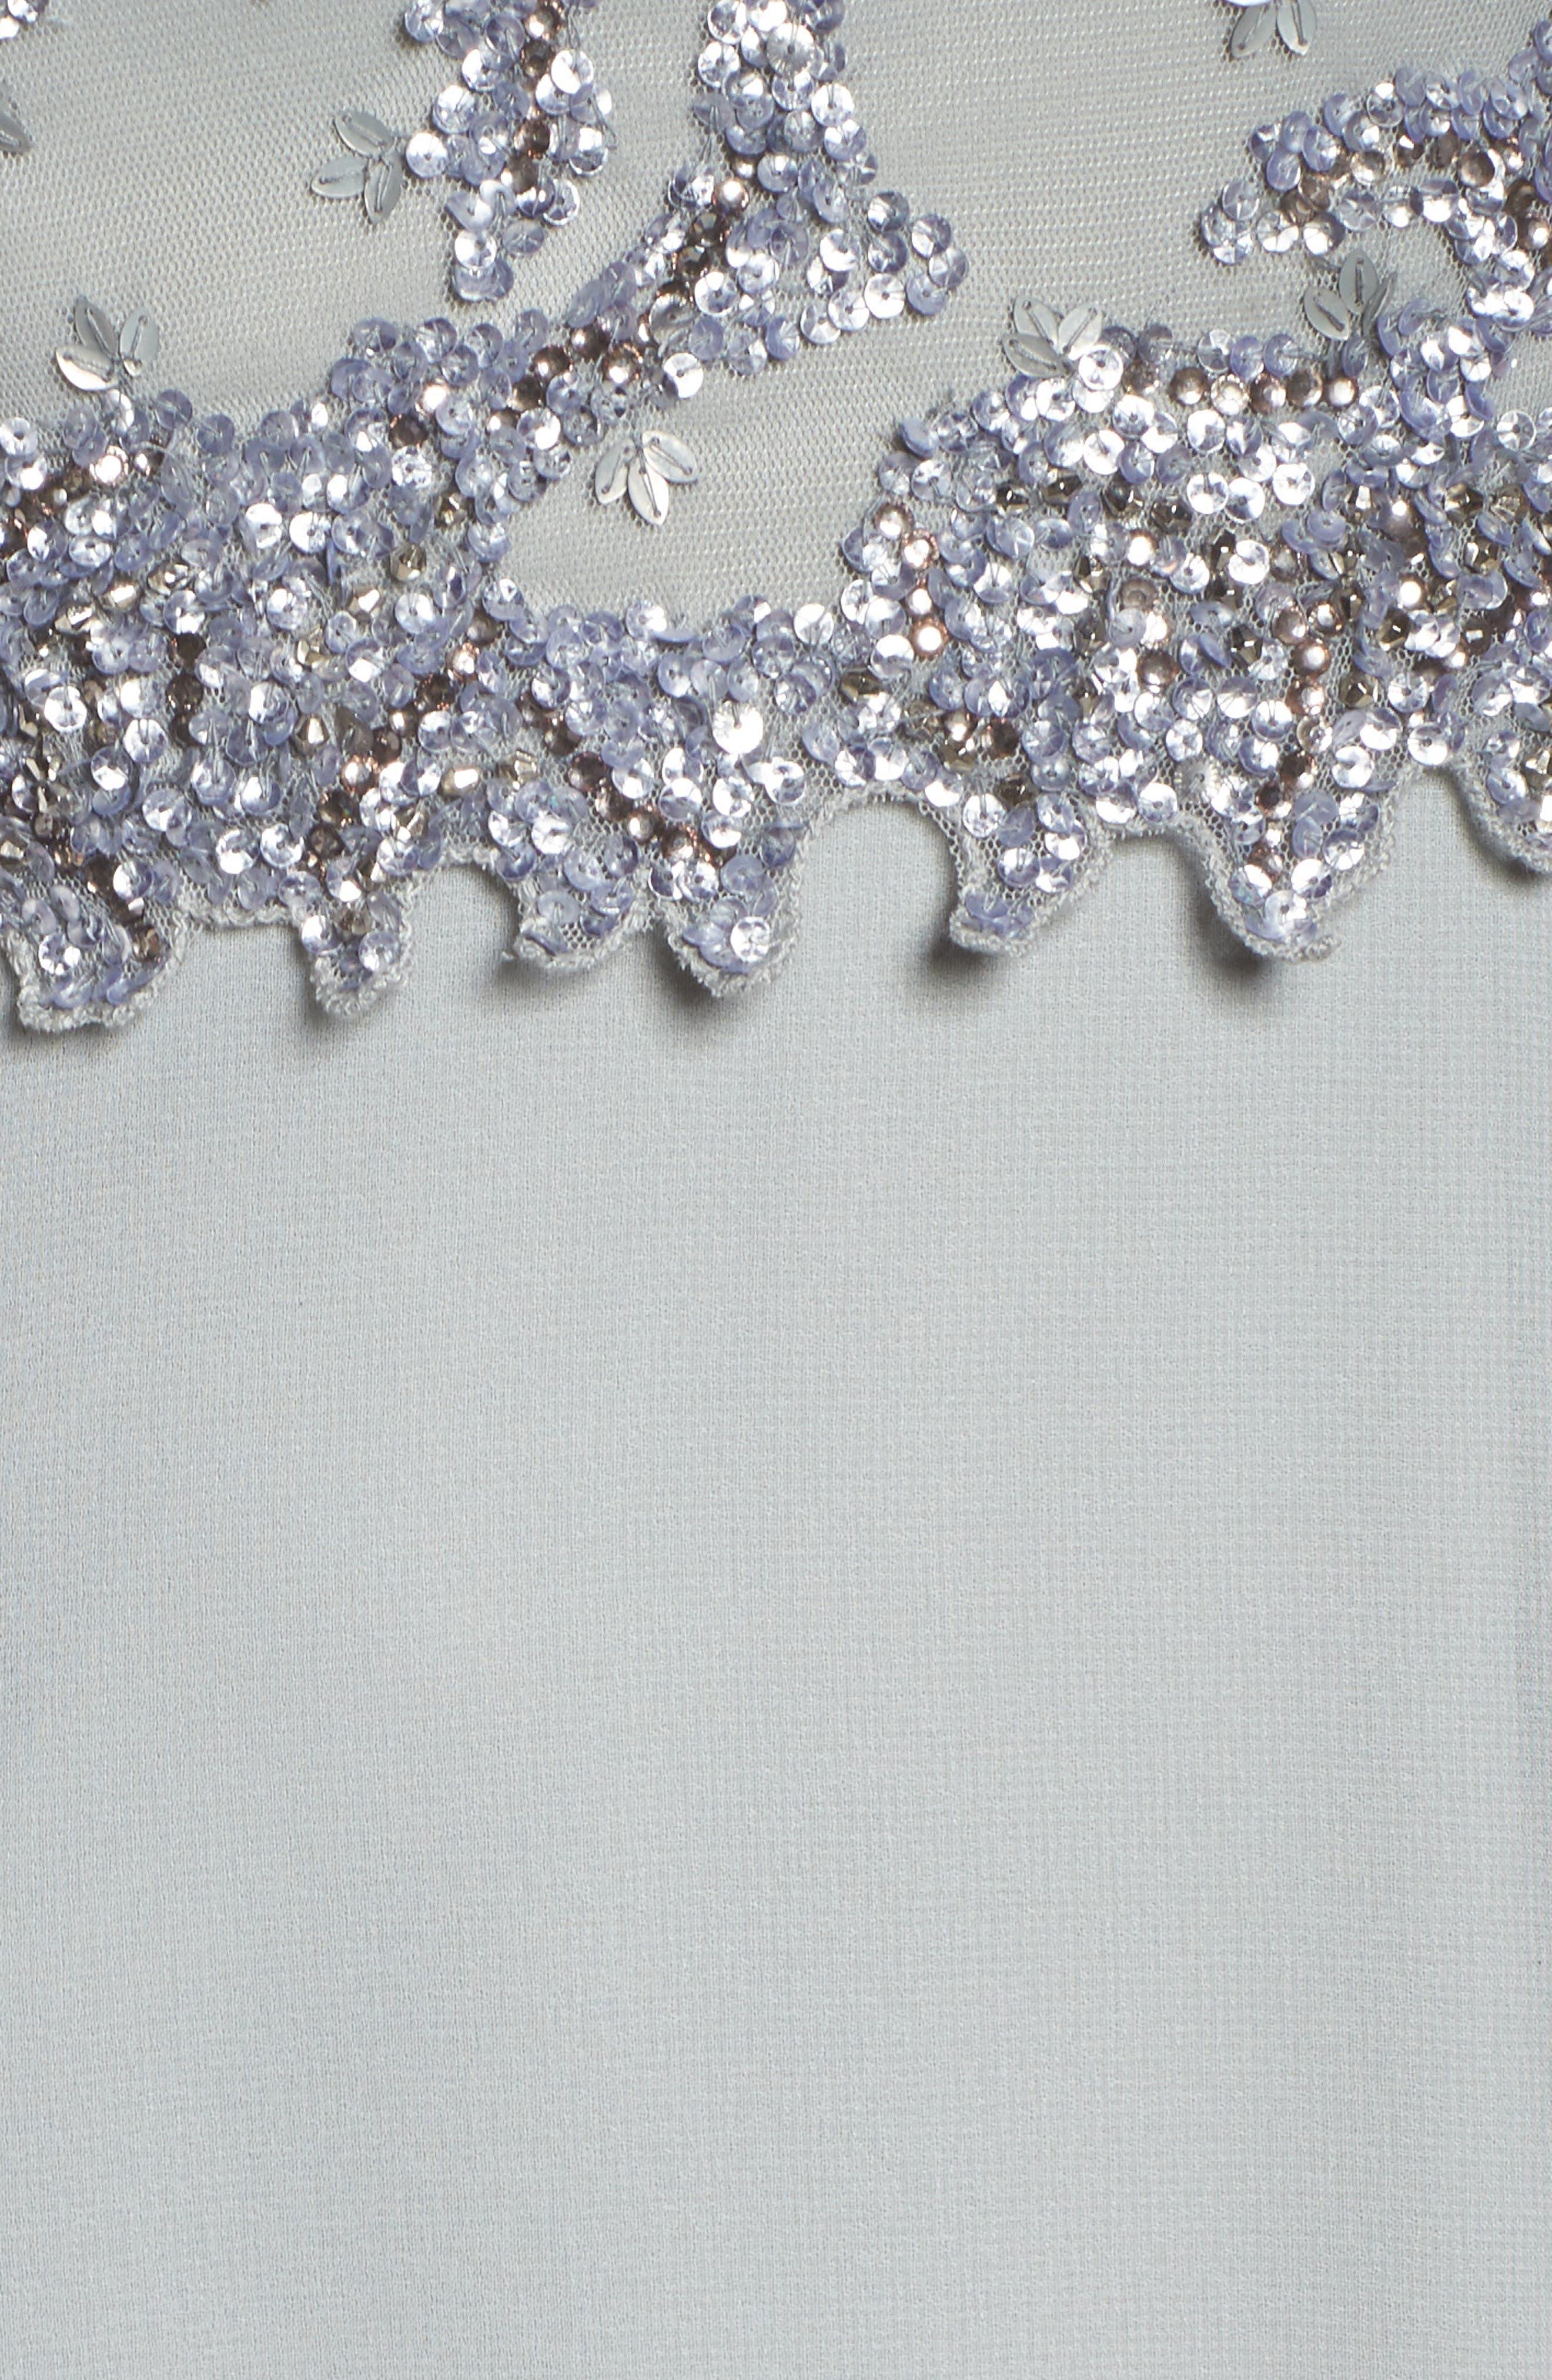 Embellished Mesh Bodice Gown,                             Alternate thumbnail 5, color,                             Blue Mist